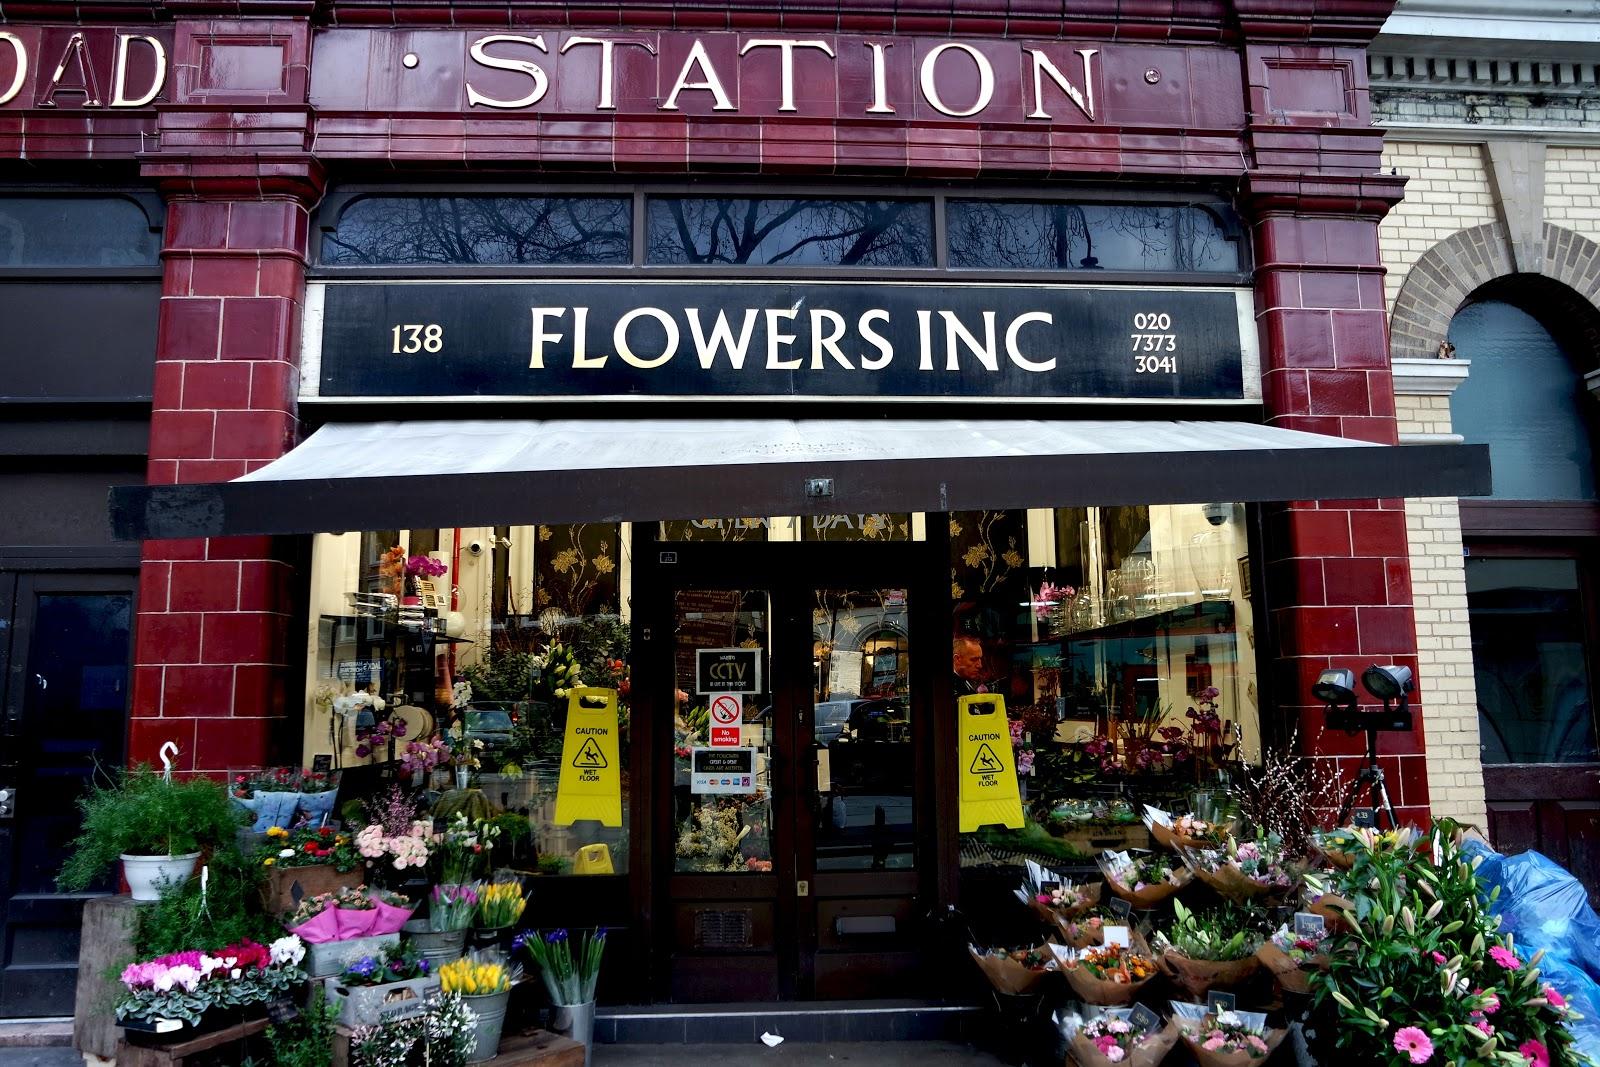 Gloucester Road, station, London, Londres, vlog, blog, travel, travelling, london streets, french,